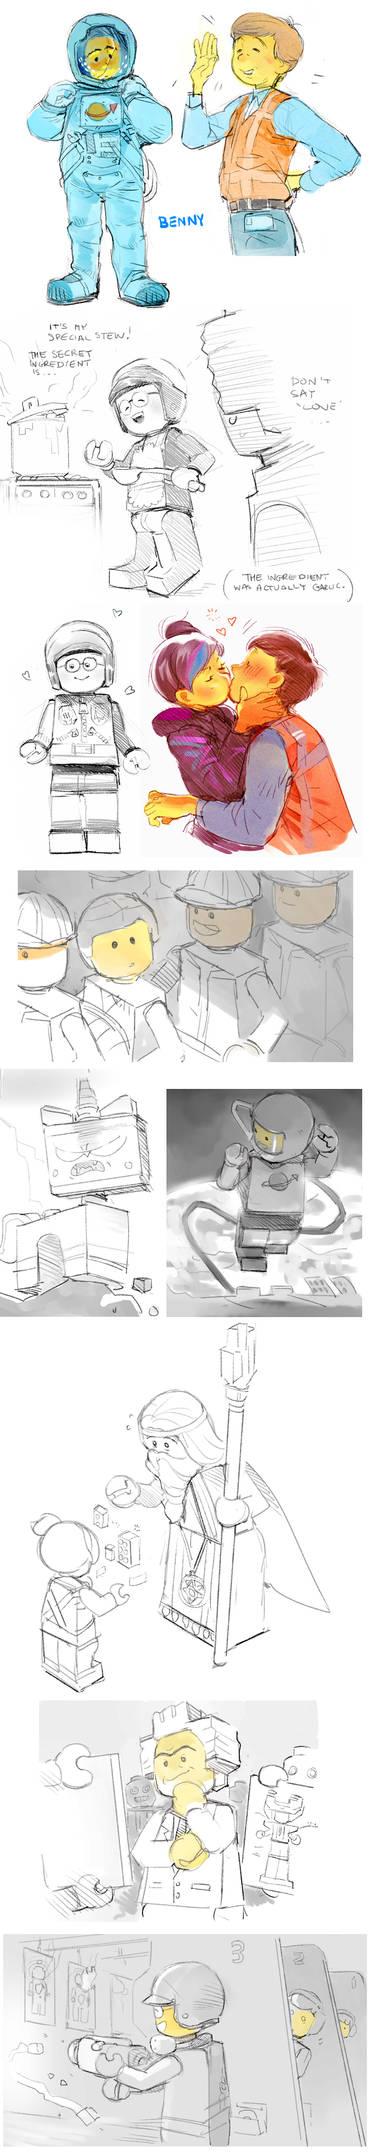 Lego Movie doodles 2